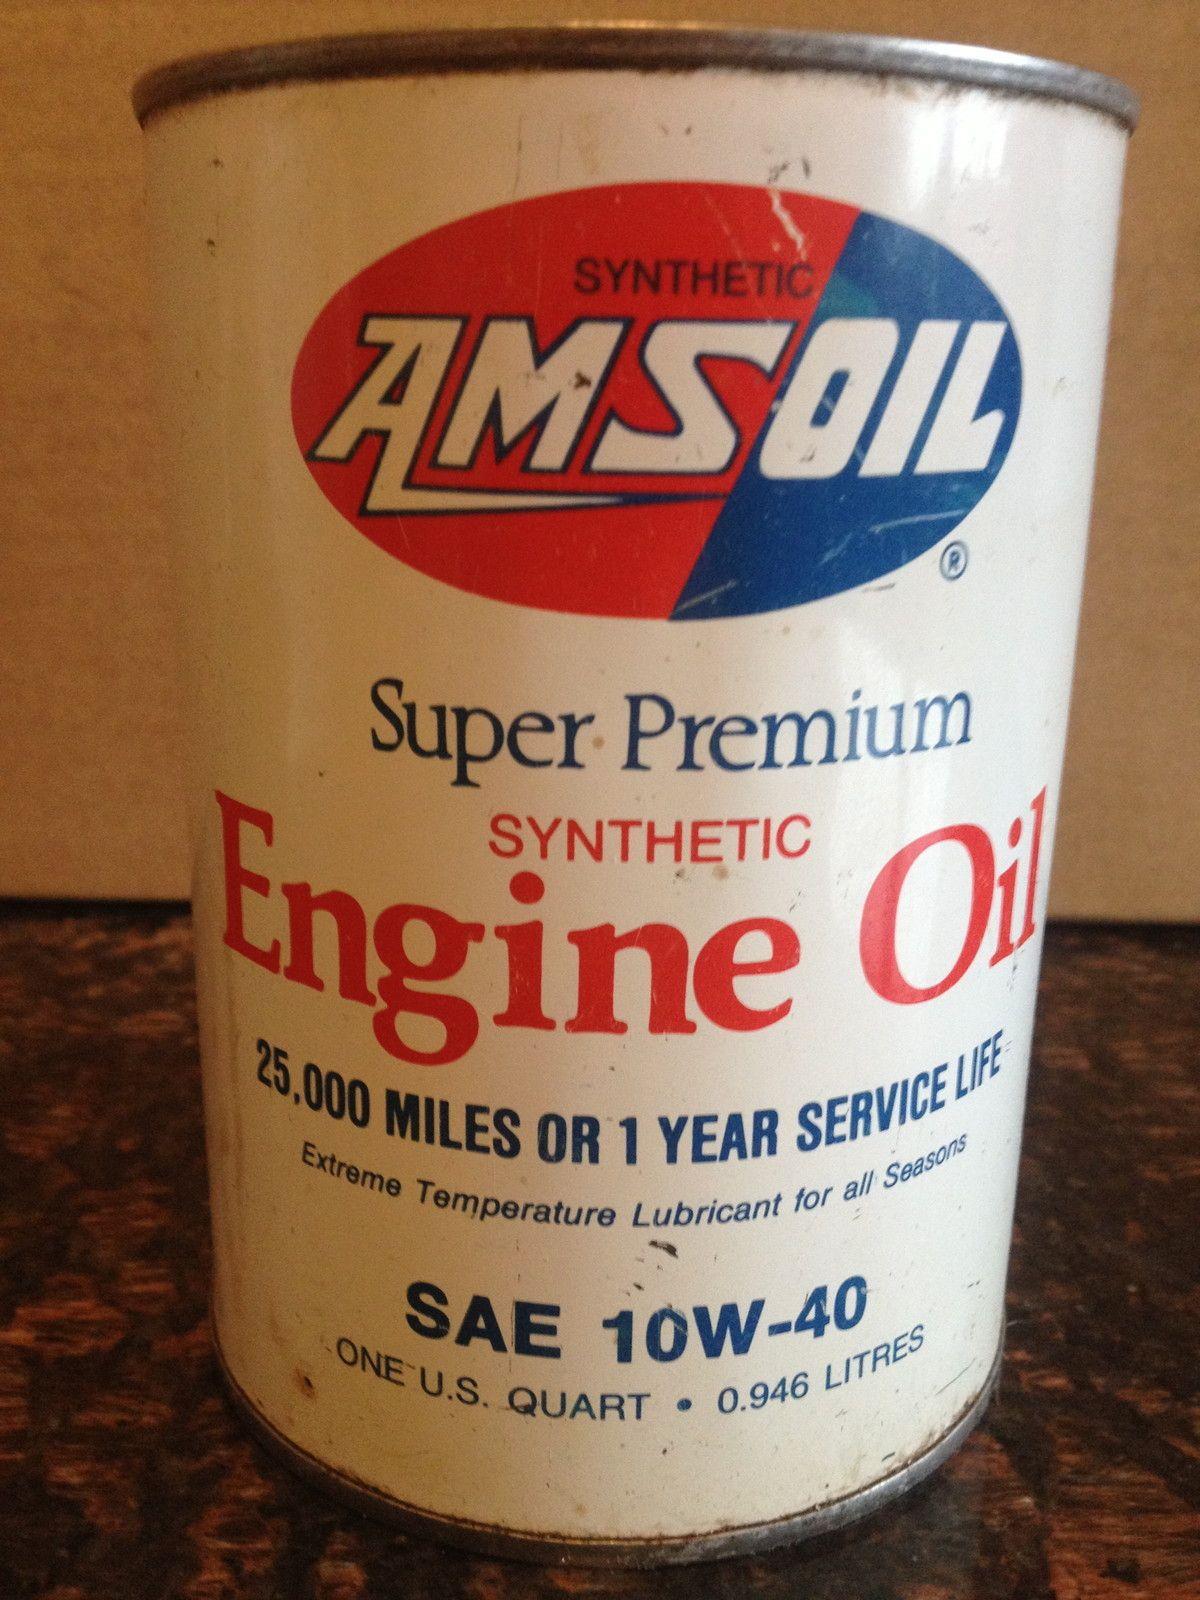 Amsoil Synthetic Motor Oil Vintage Oil Cans Vintage Gas Pumps Oils